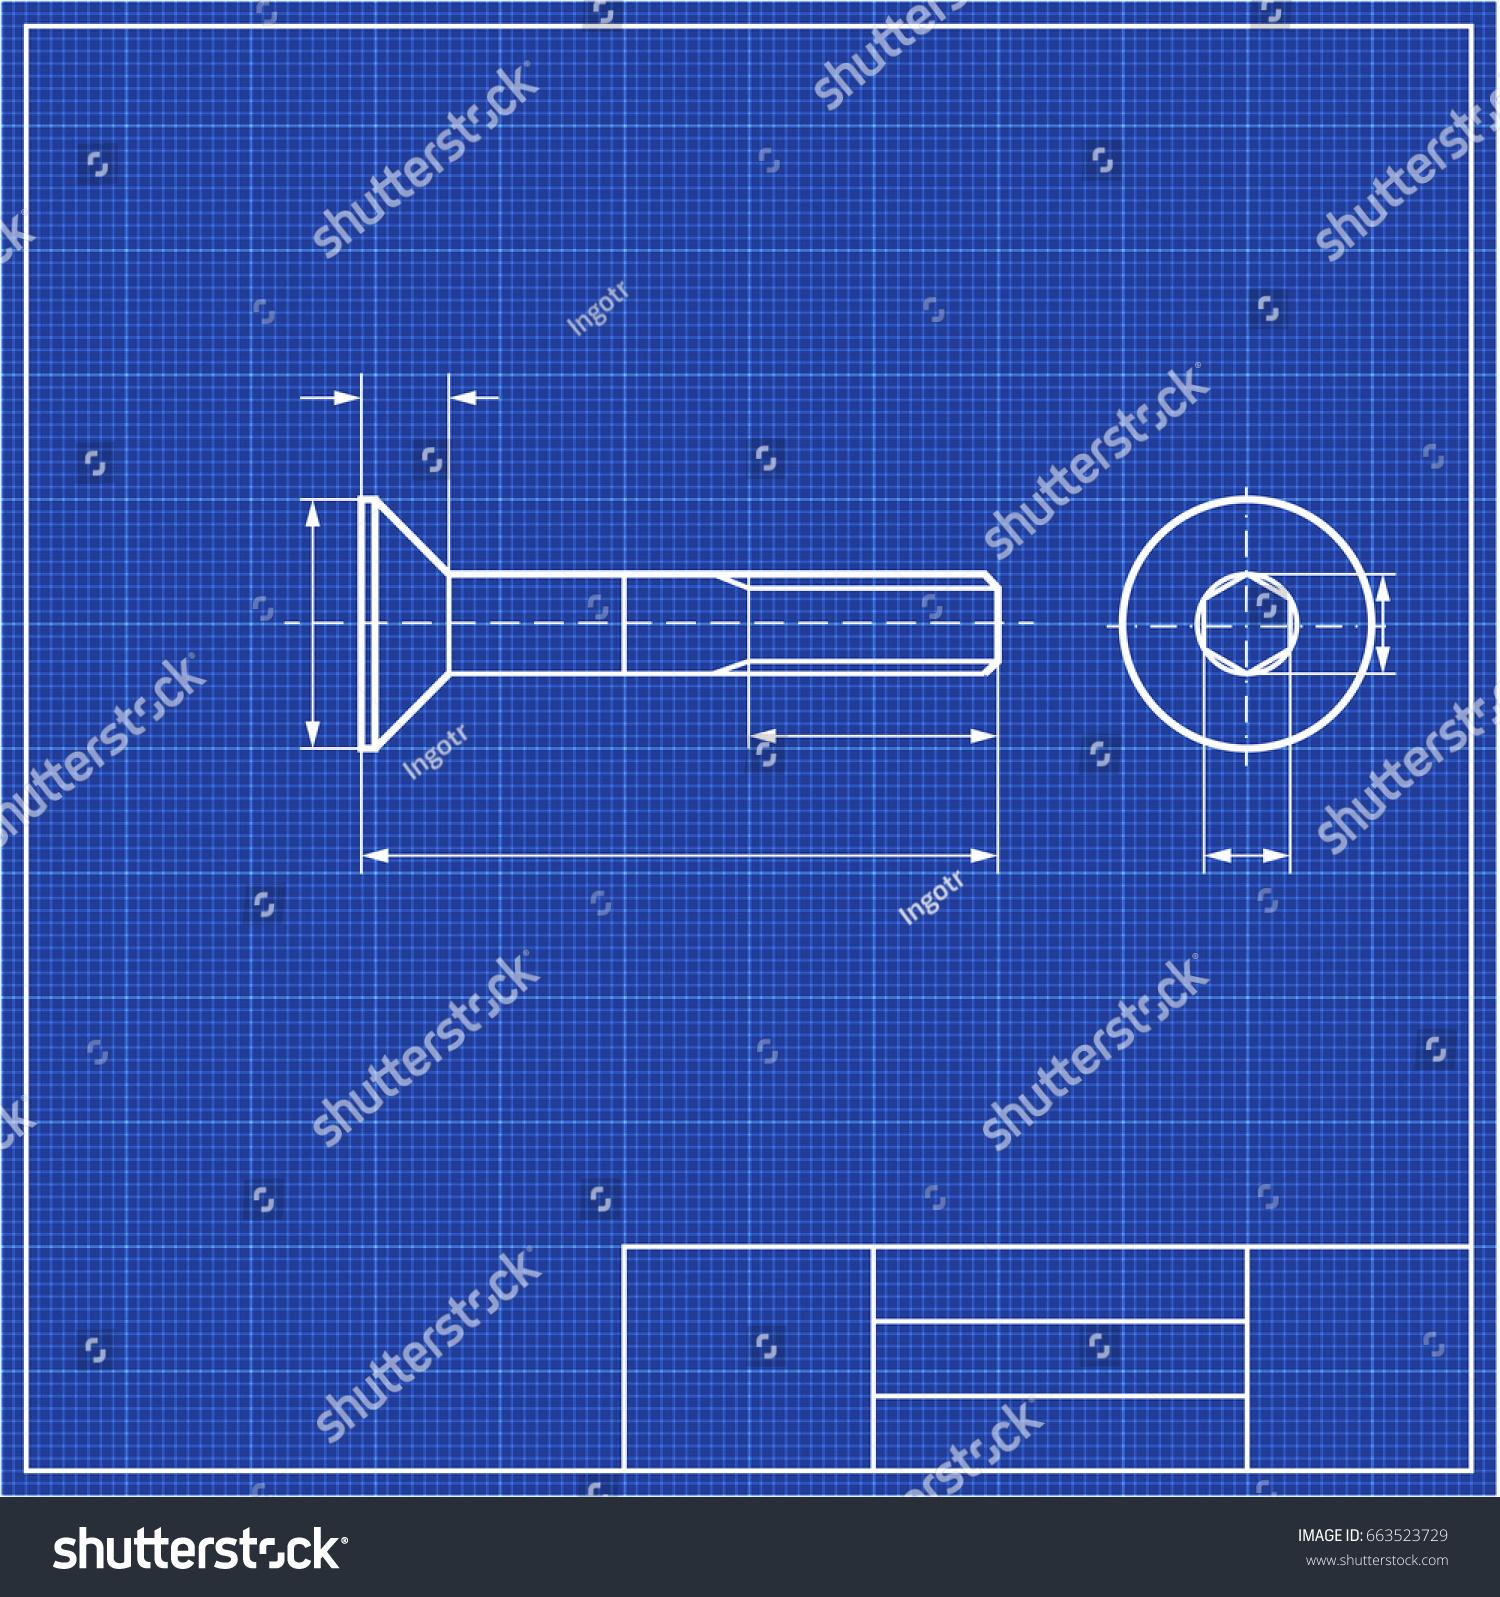 Blueprint screw profile hidden hex framework stock photo photo blueprint screw profile with hidden hex and framework scale blueprints mechanical engineering drawings of malvernweather Image collections